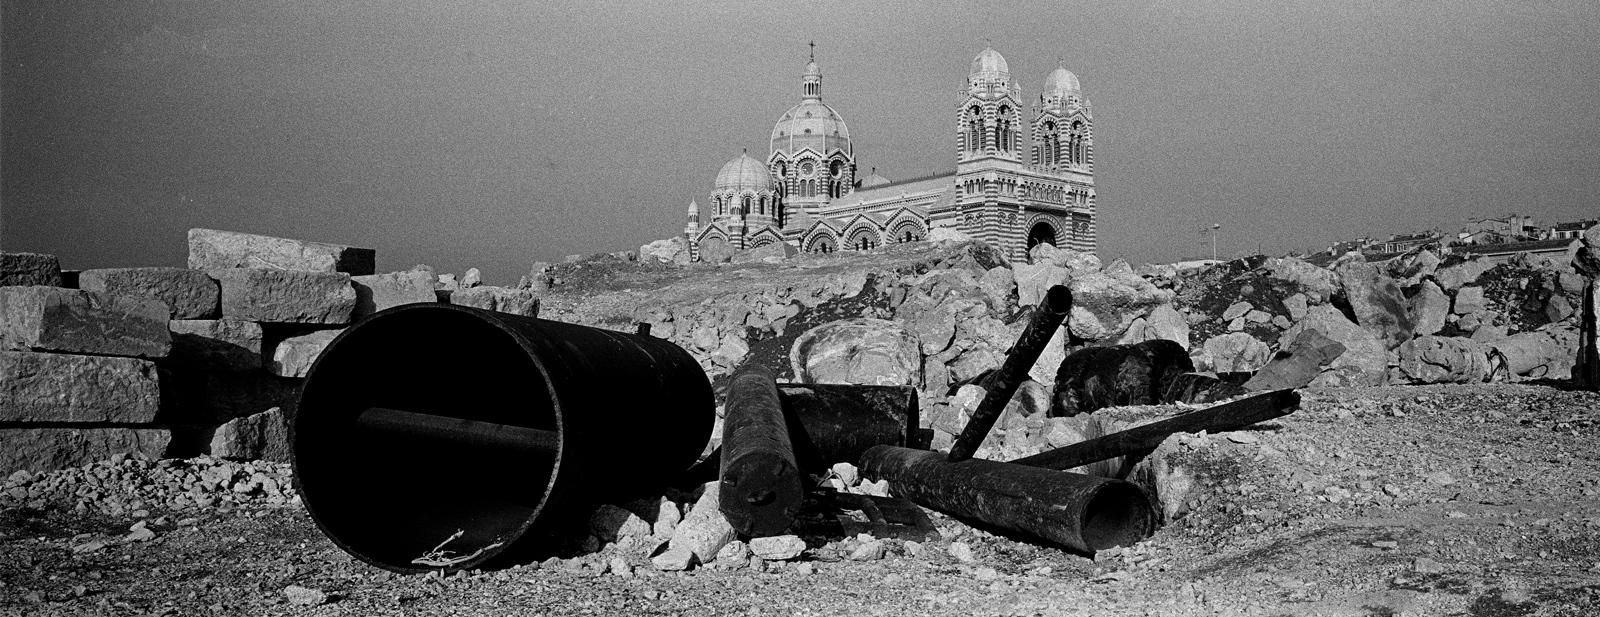 Art and Documentary Photography - Loading 036_Marseille___Fabio_Sgroi.jpg